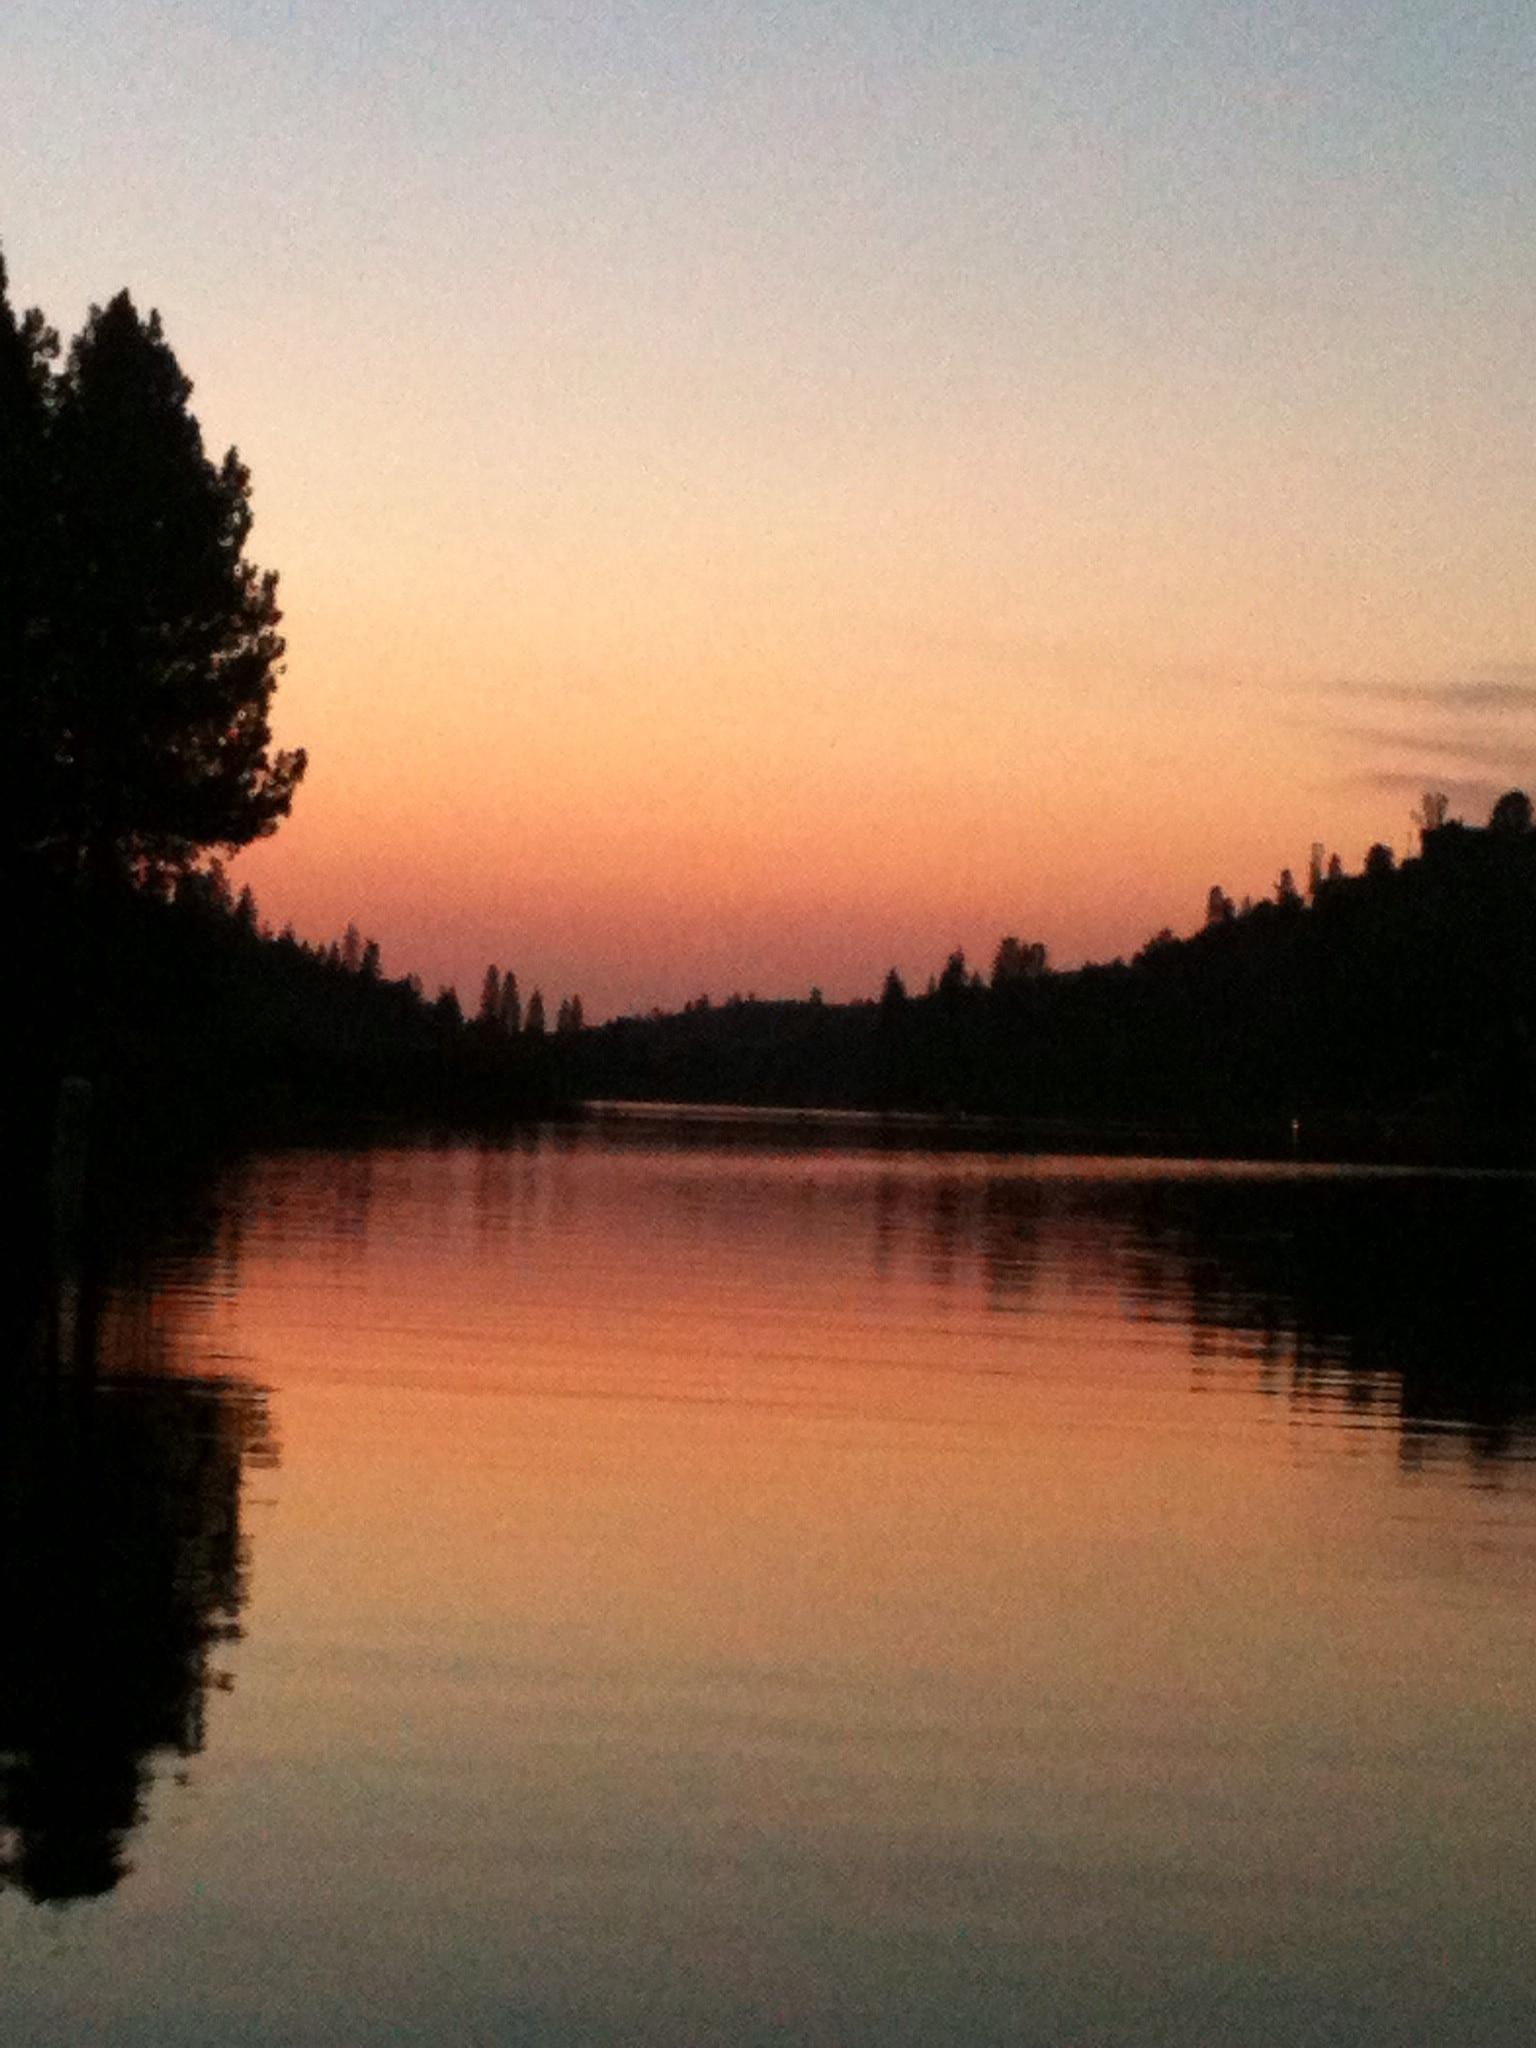 Pine Mountain Lake, Groveland, California, United States of America